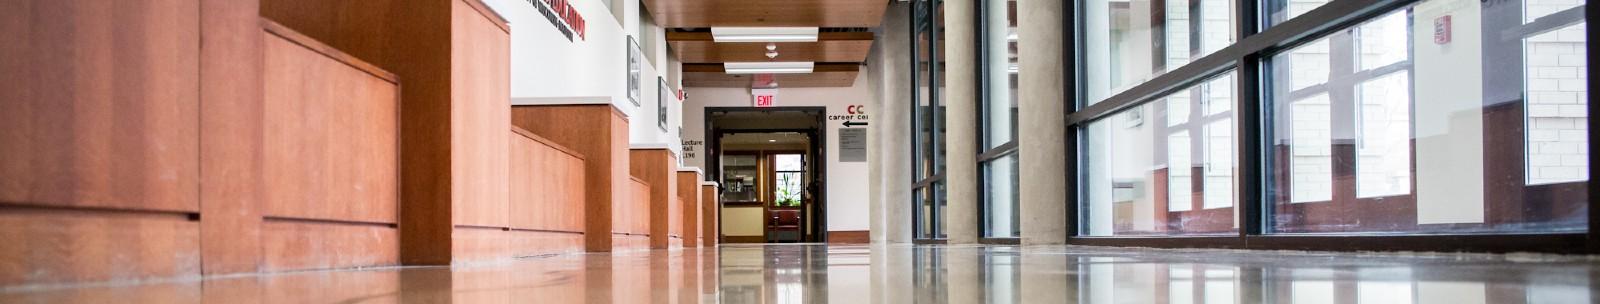 hallway in the uw madison education building